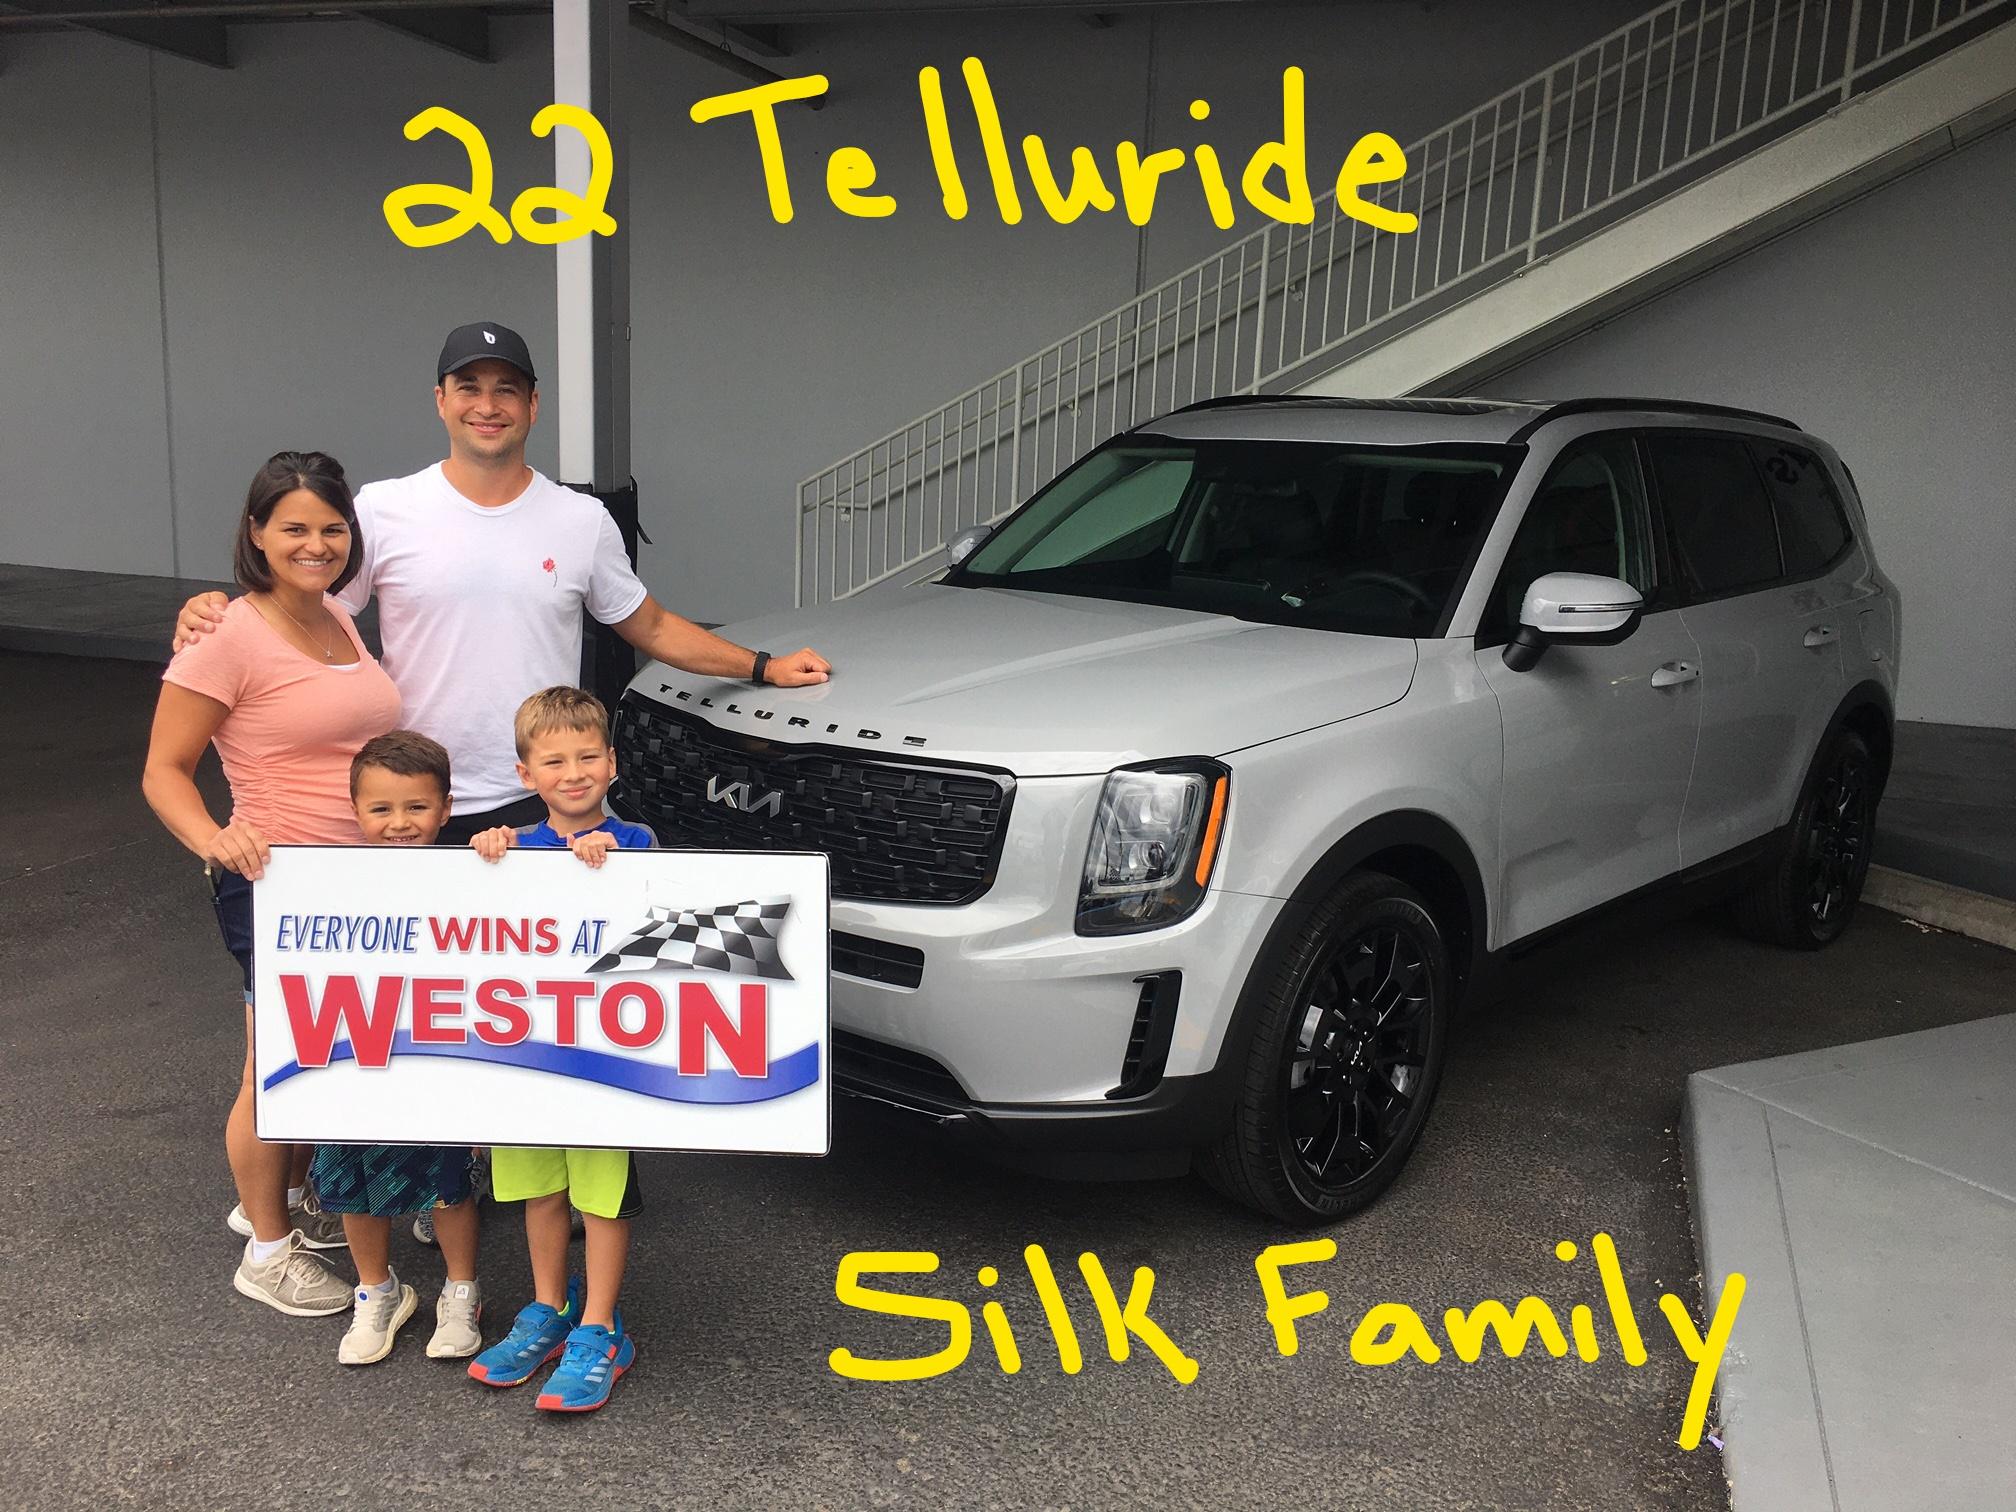 22 Telluride Silk Family